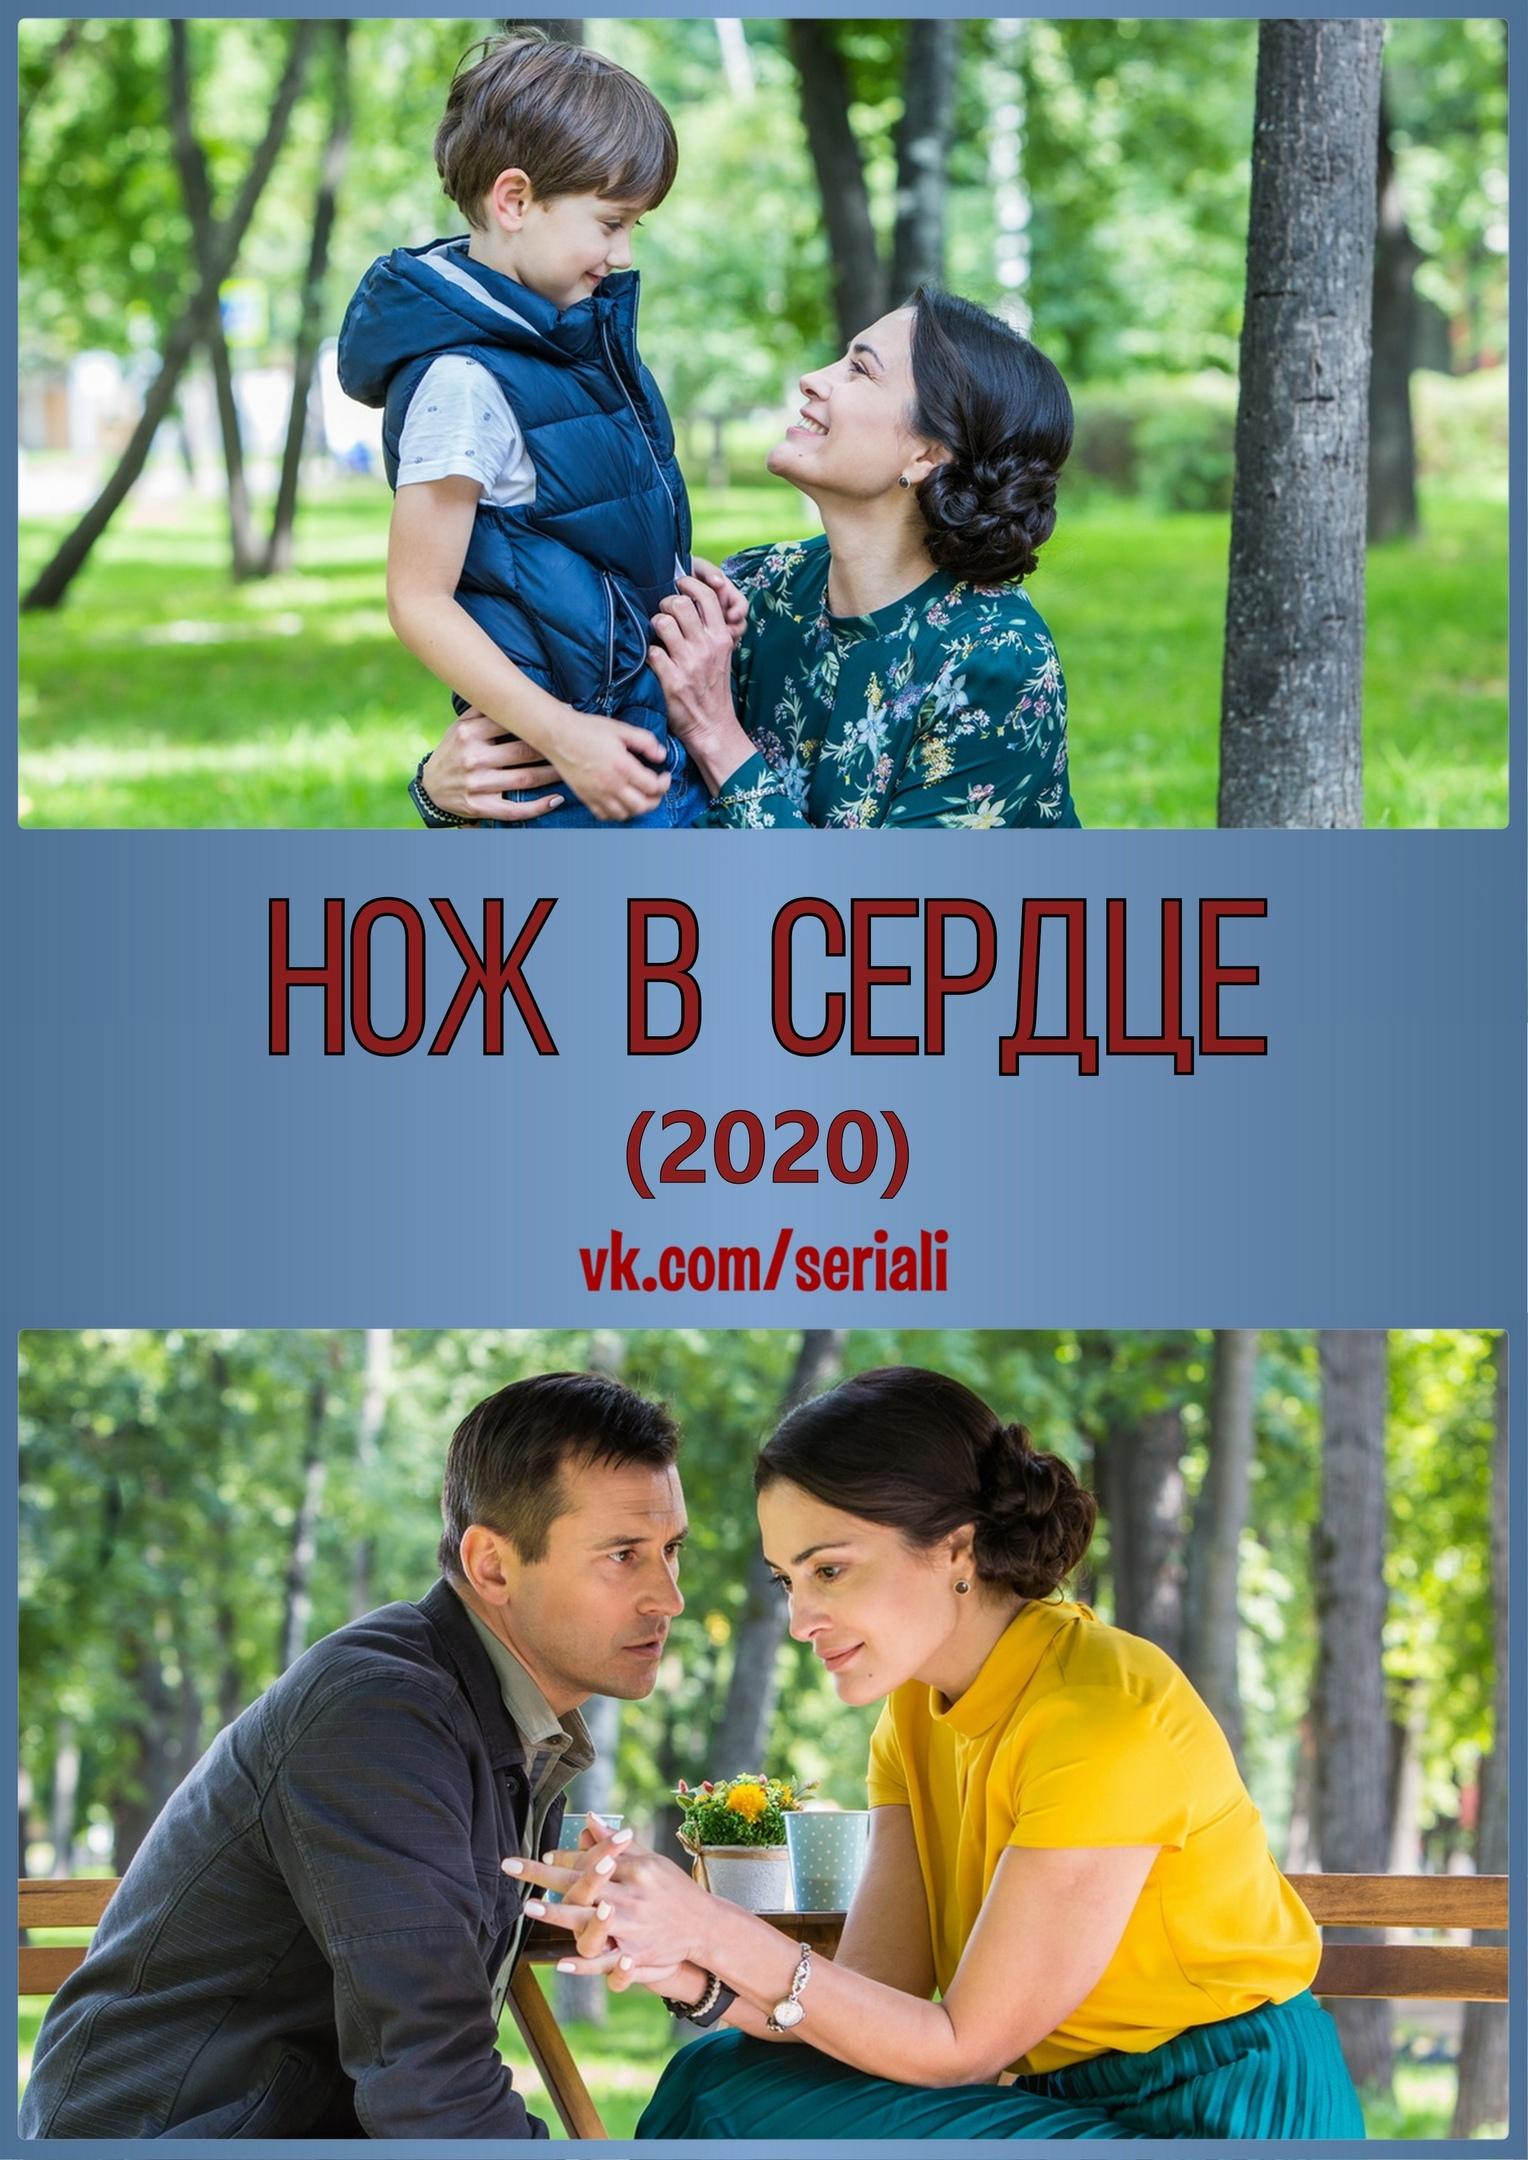 Детектив «Hoж в cepдцe» (2020) HD